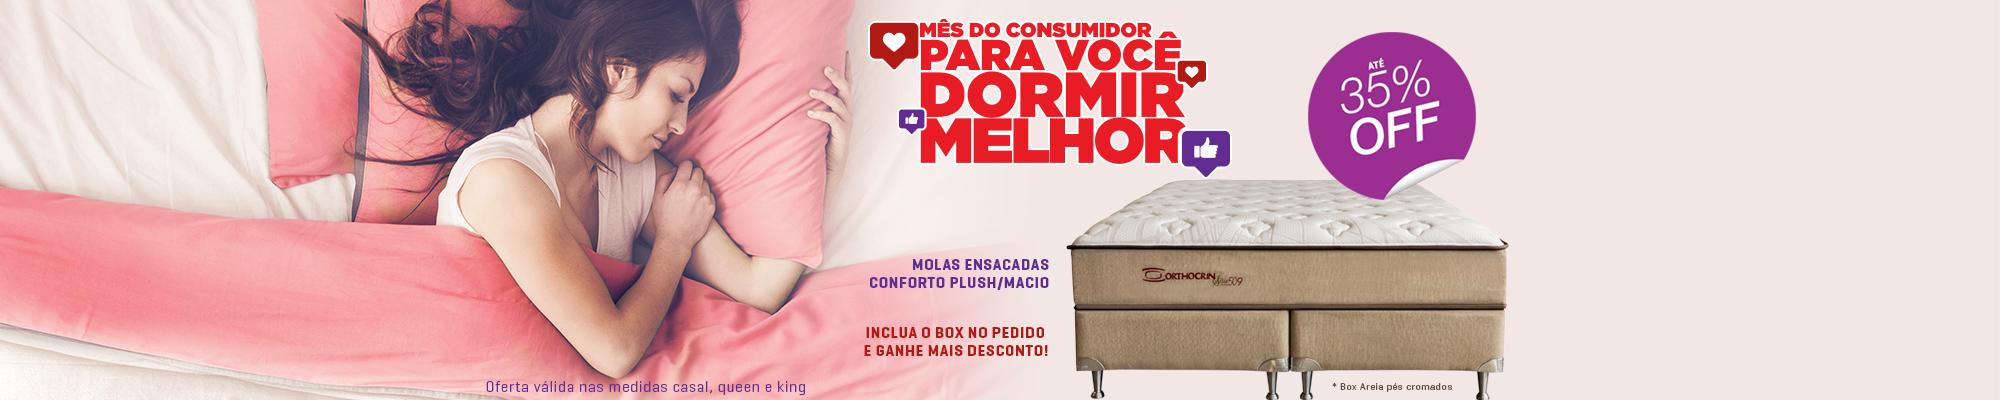 Consumidor 509